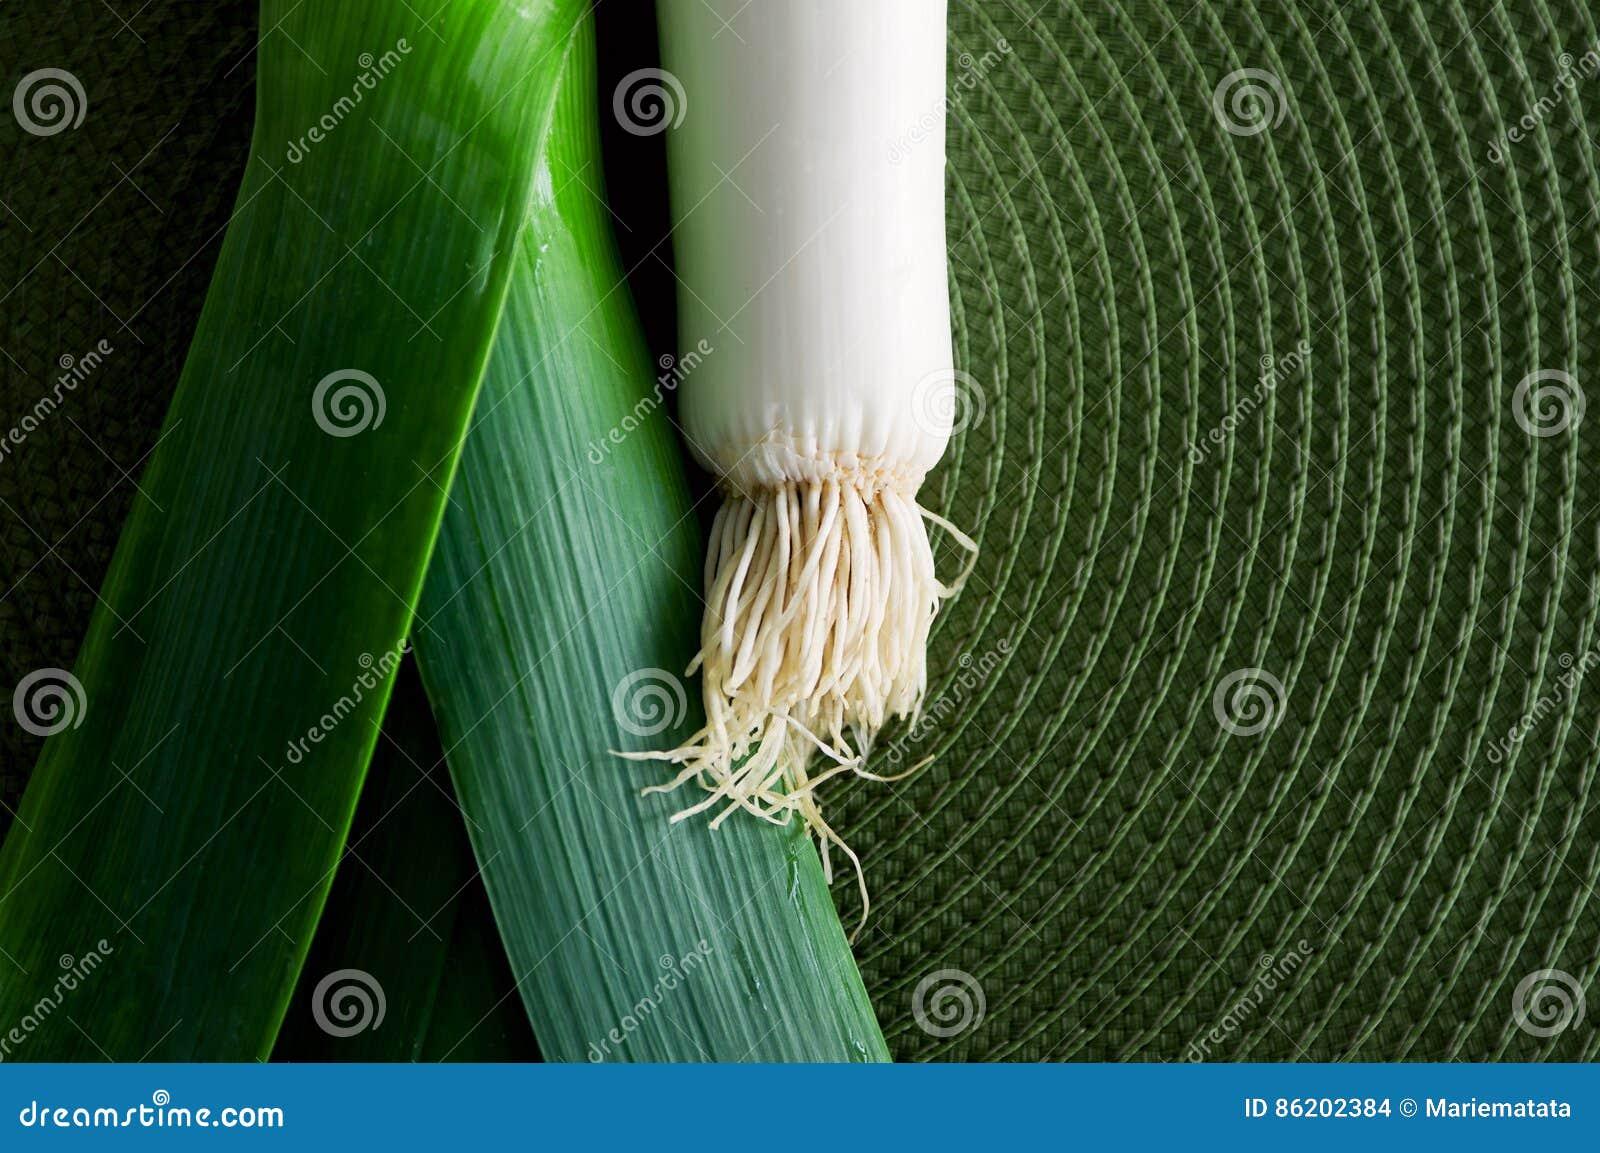 Leek over green